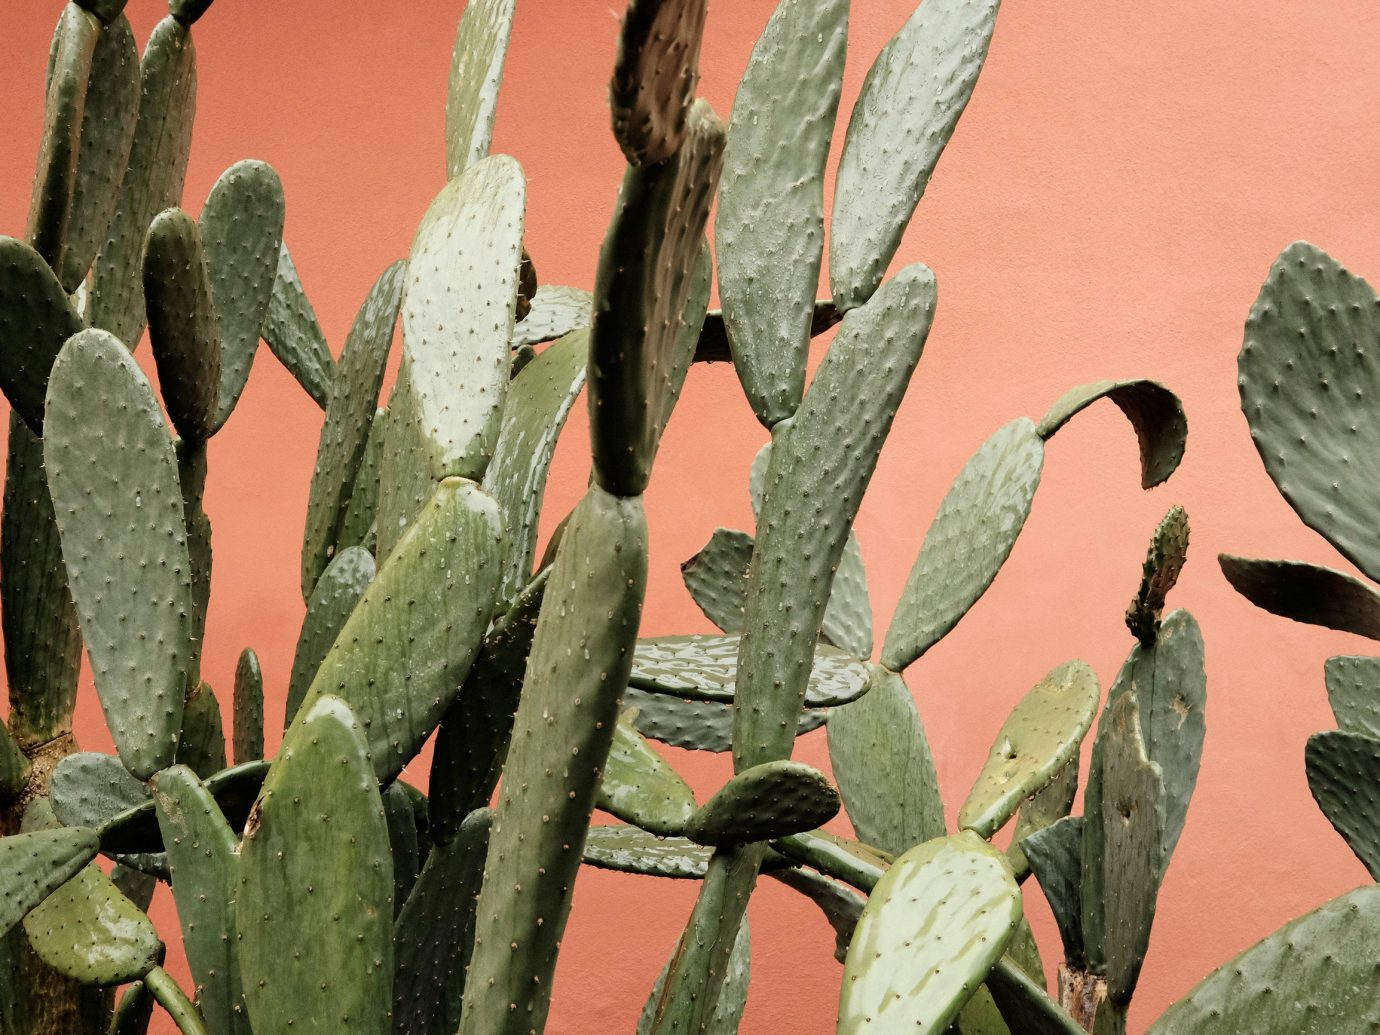 Style + Design cactus Nature plant flora flower botany land plant flowering plant hedgehog cactus leaf nopal prickly pear thorns spines and prickles barbary fig caryophyllales plant stem